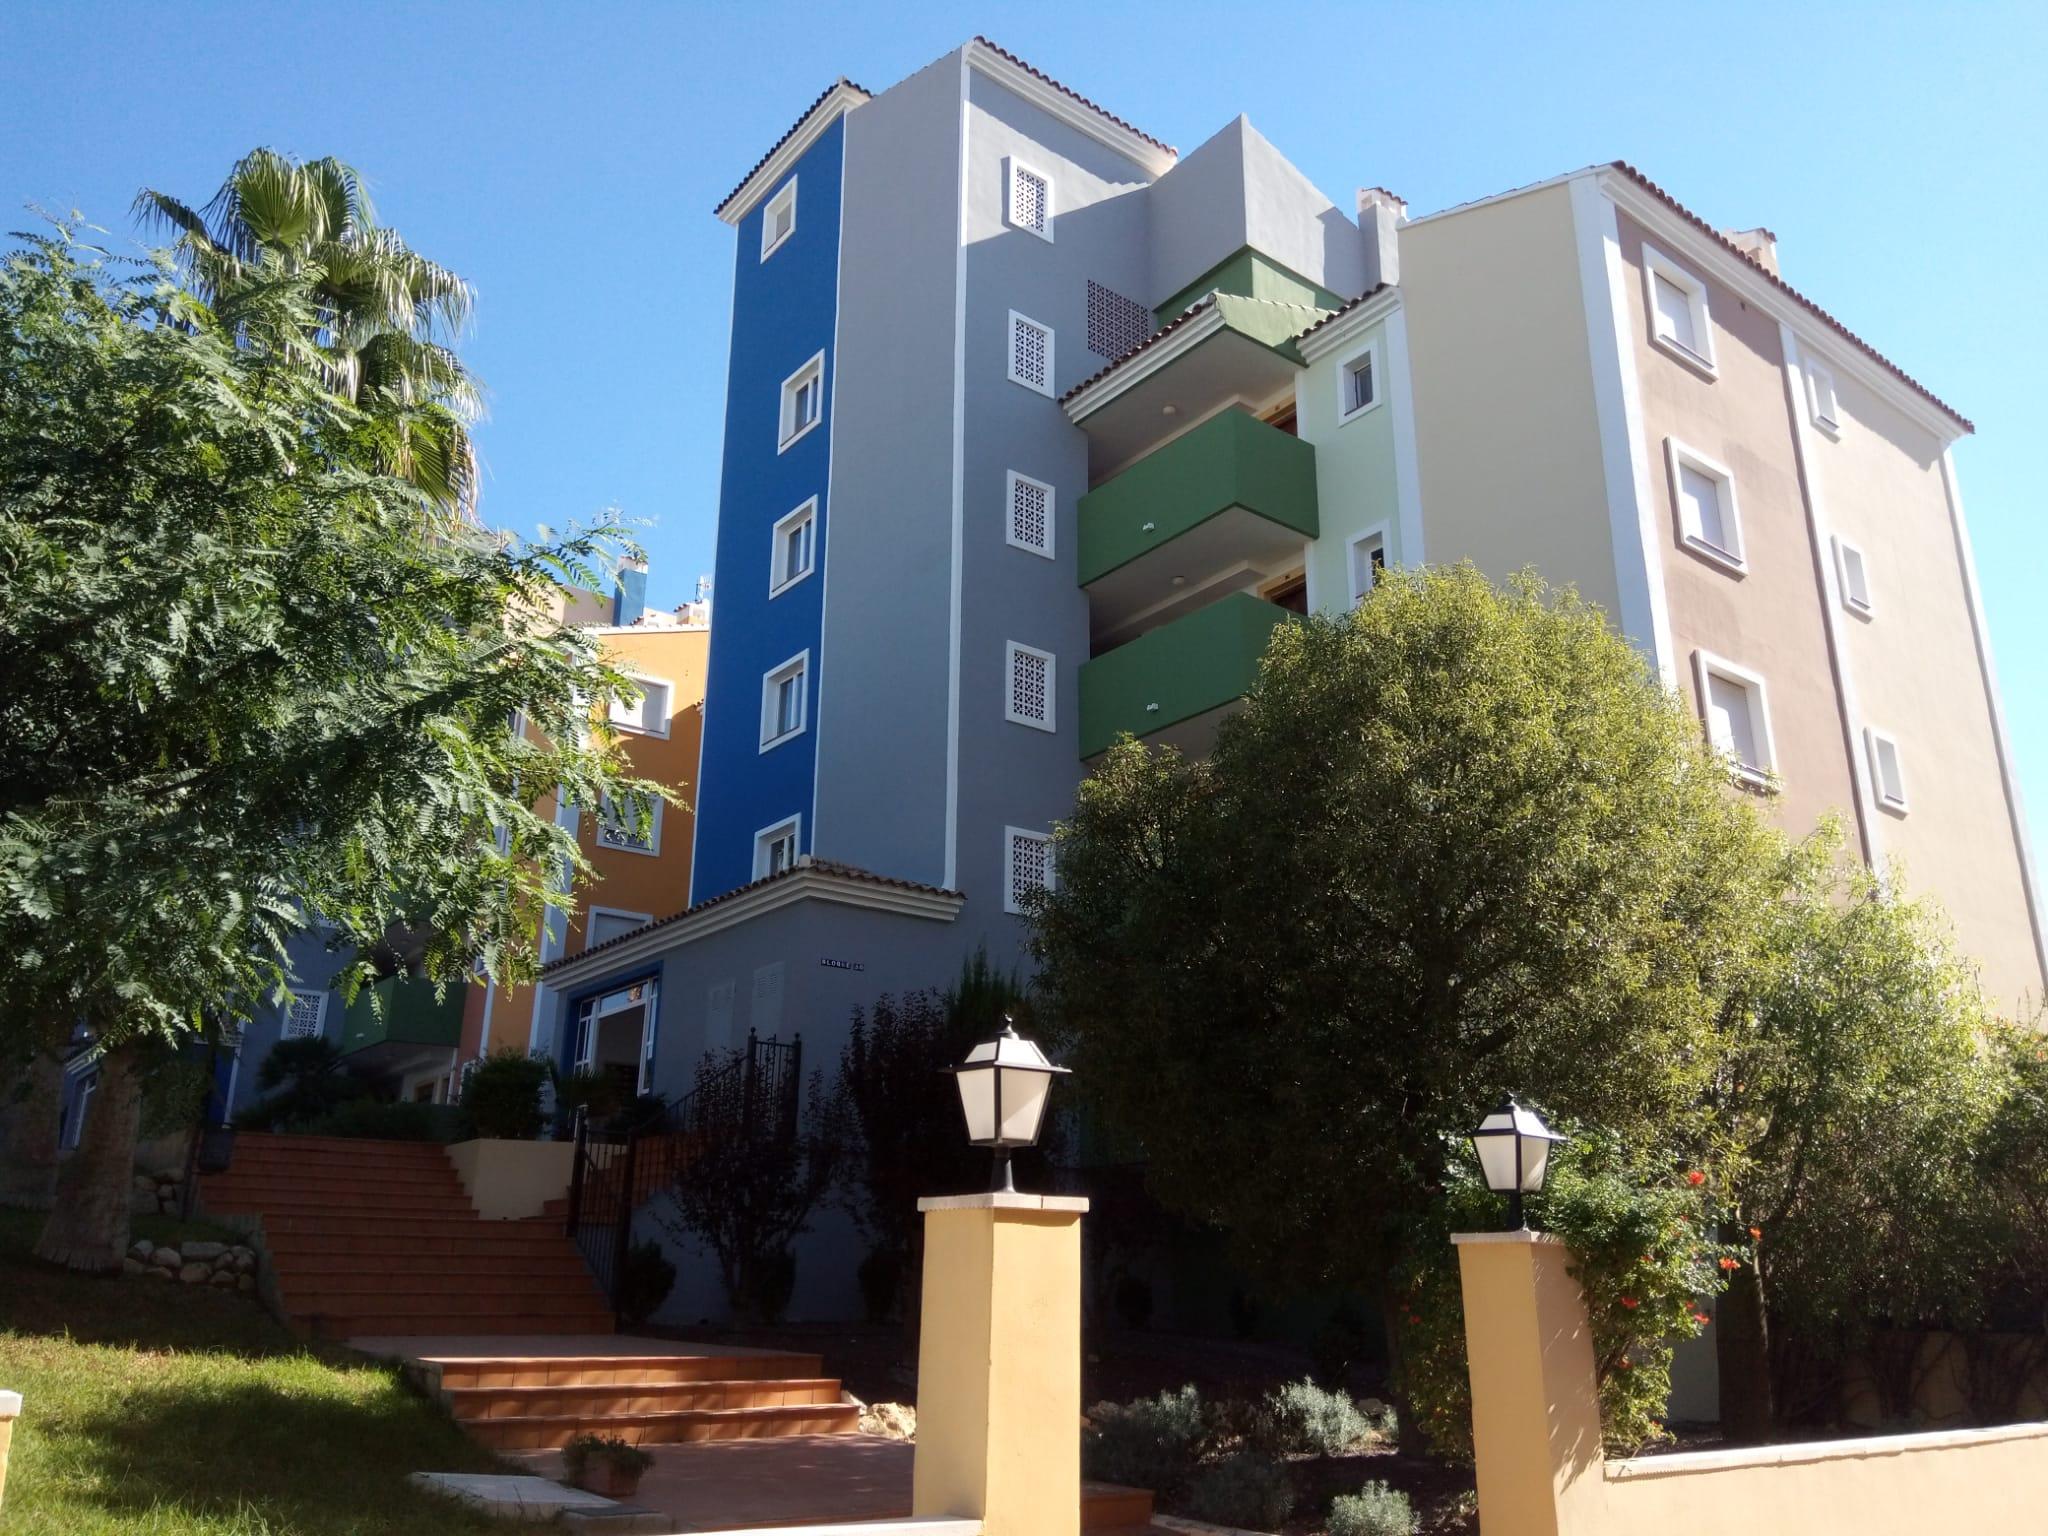 2 bedroom apartment for sale on Bonalba Golf Resort – only 88,000